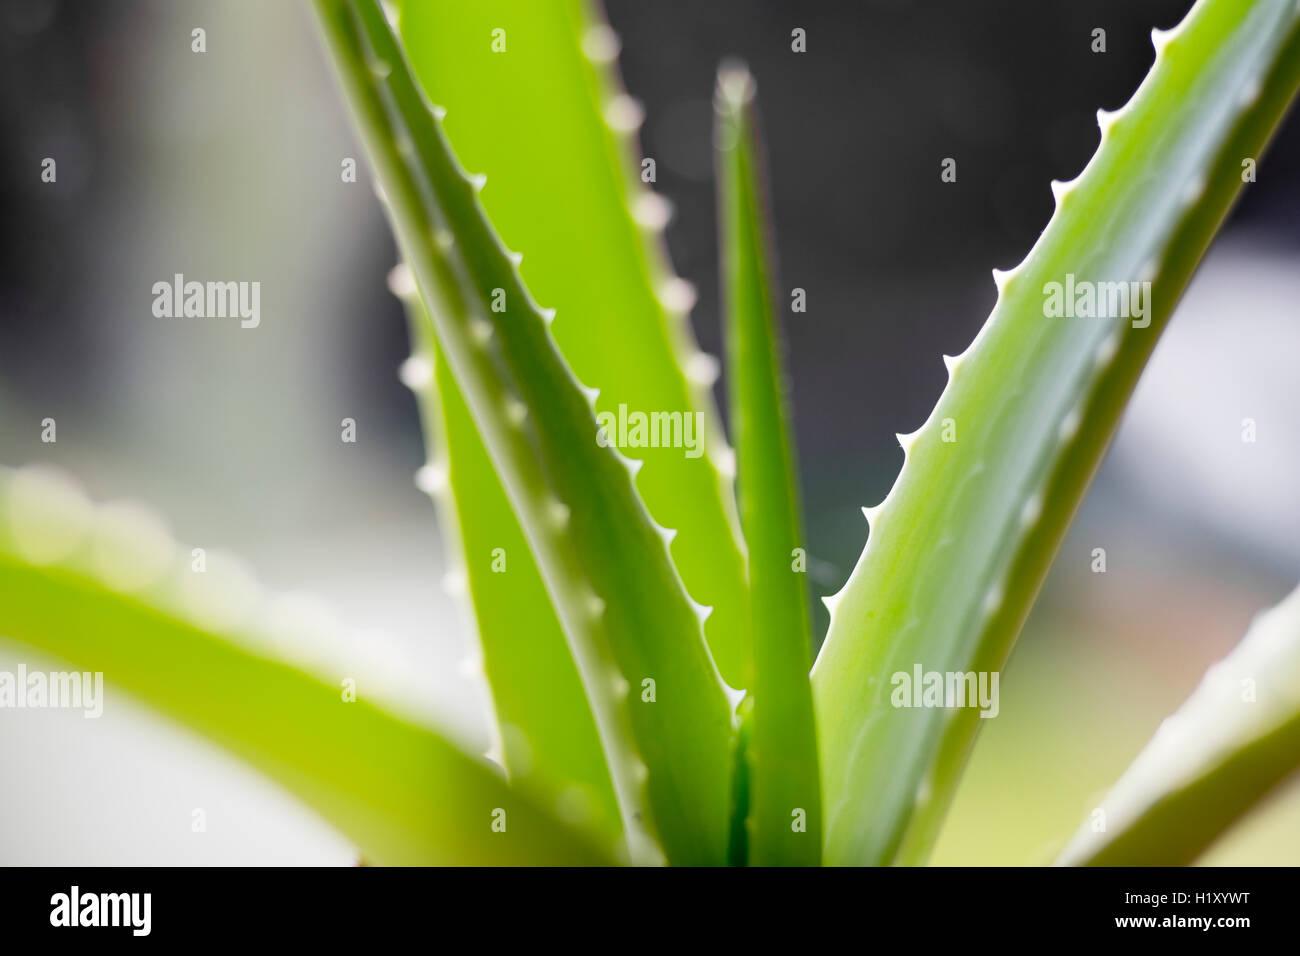 Nahaufnahme einer Aloe Vera Pflanze Stockfoto